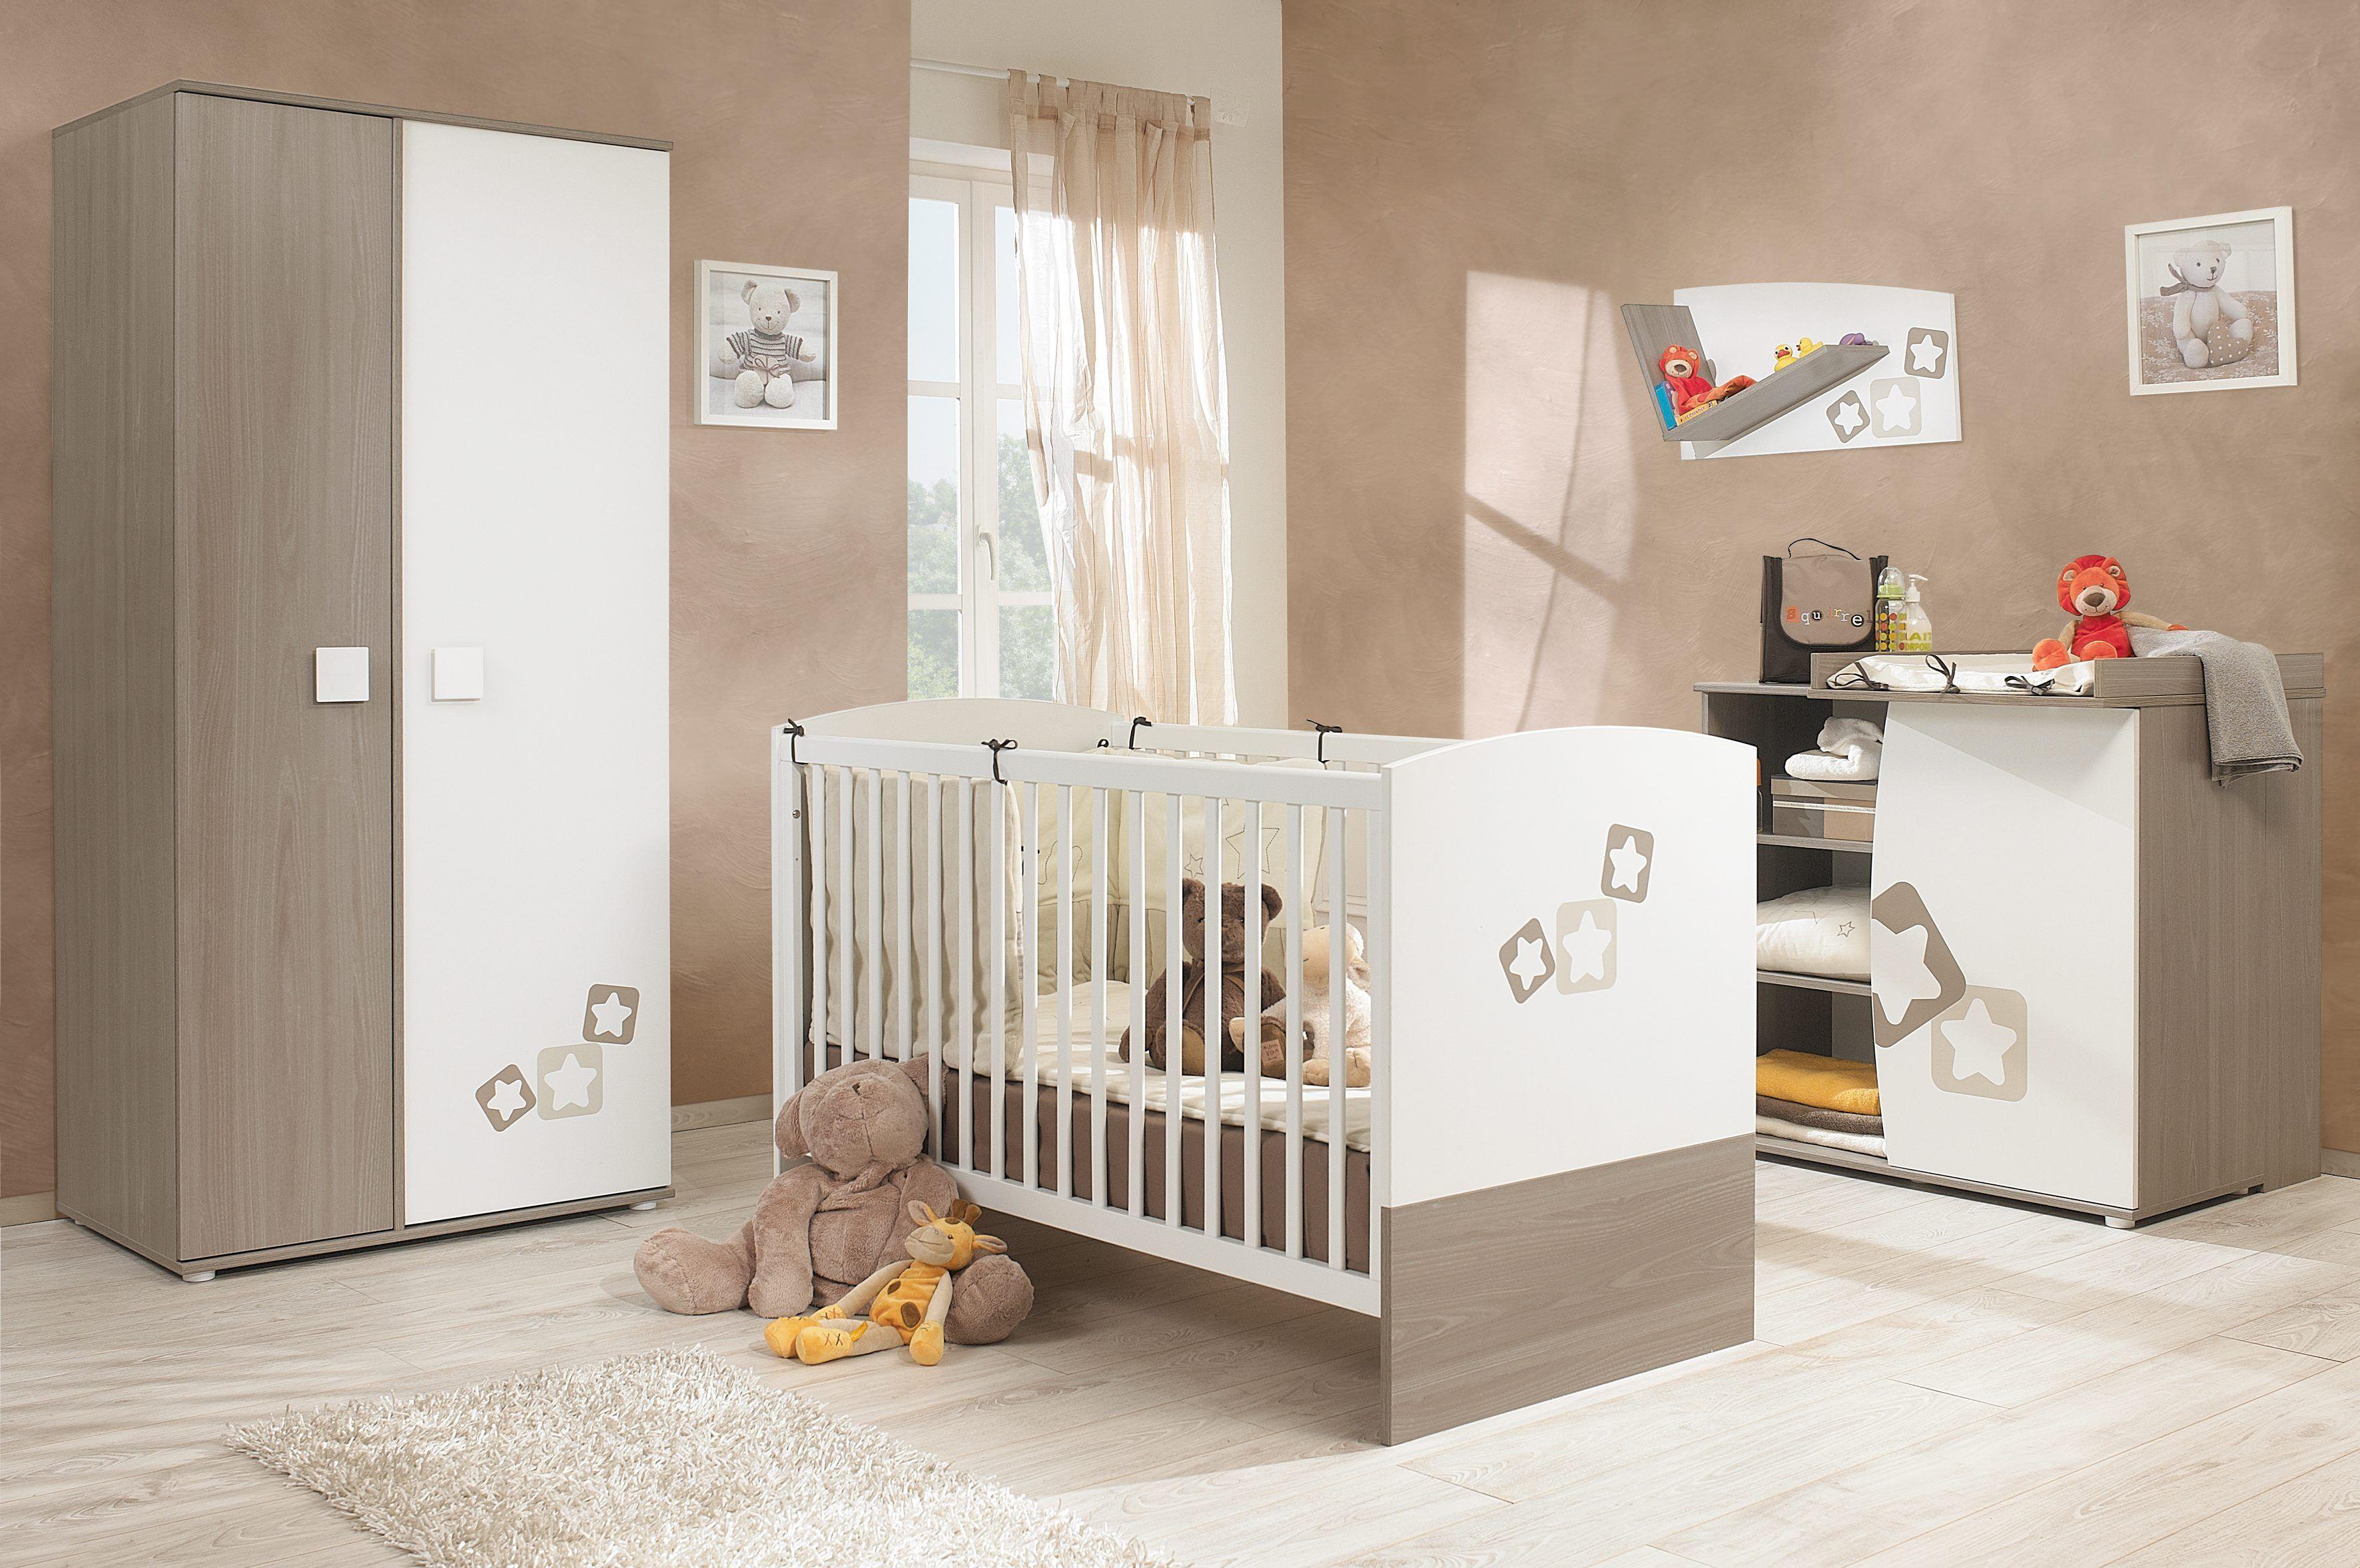 Lit bébé évolutif NOE, blanc gris taupe - BUT | Kid\'s Room ...